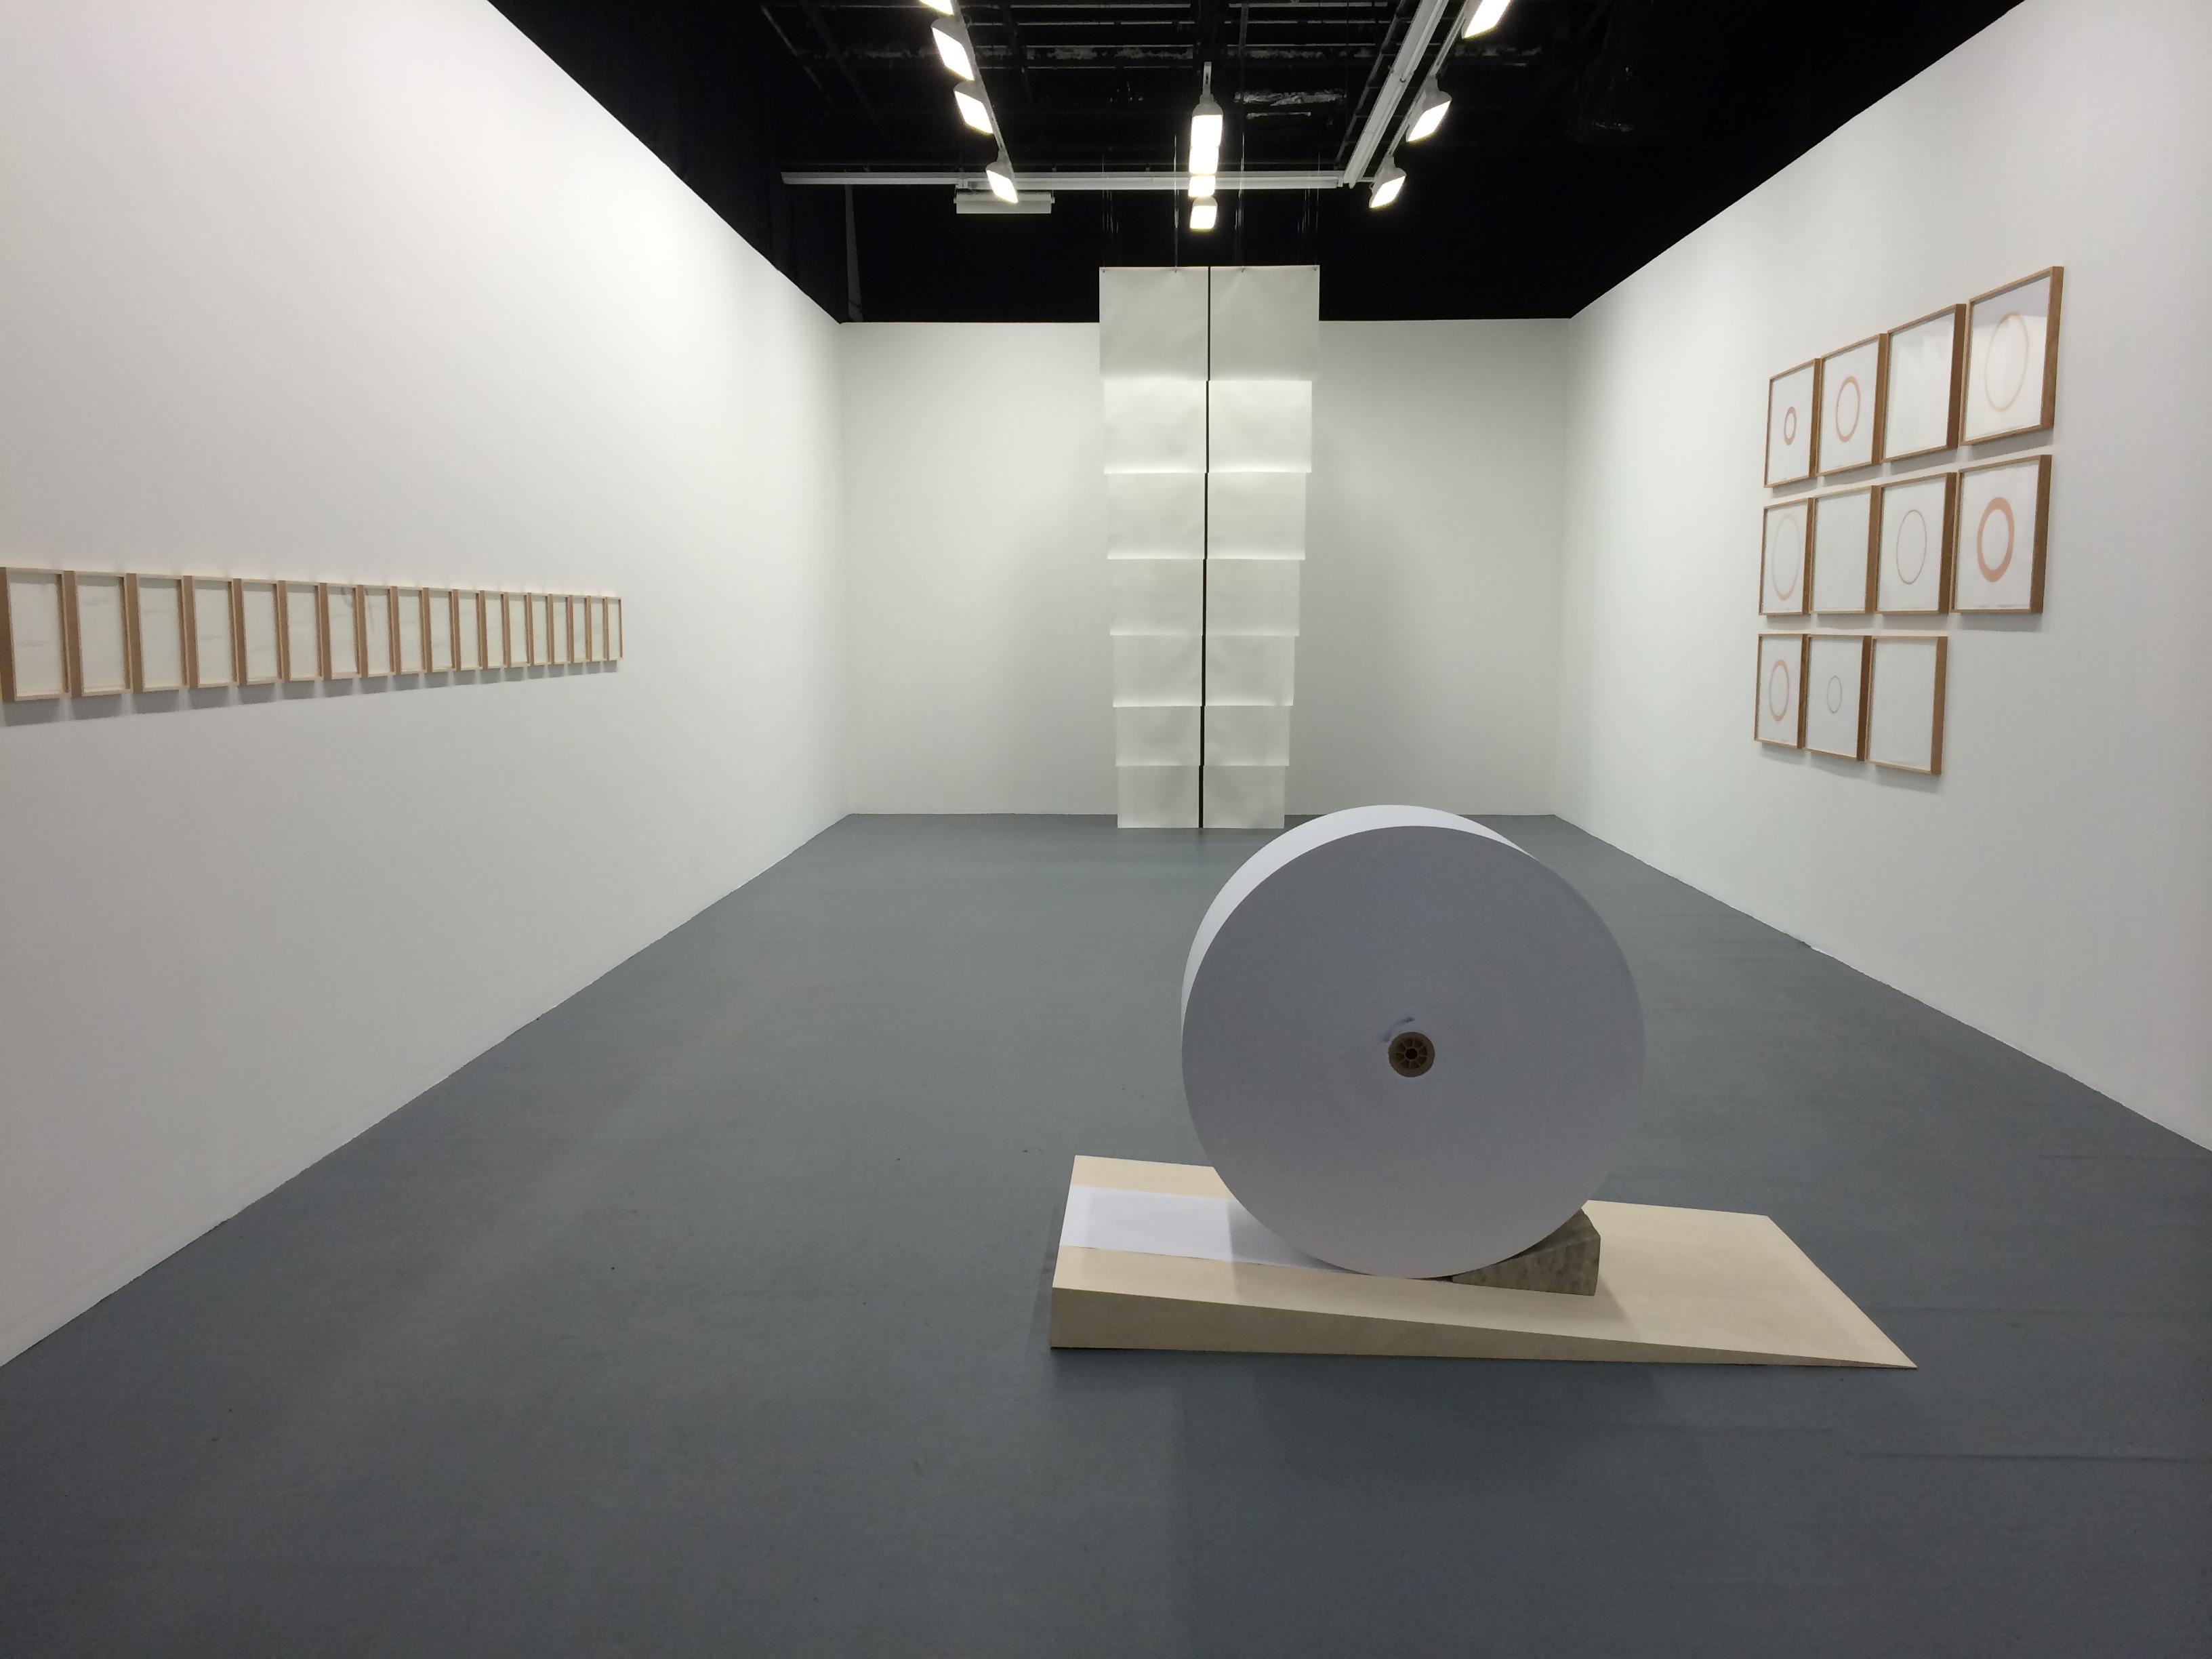 Luke Stettner, this single monument, The Kitchen